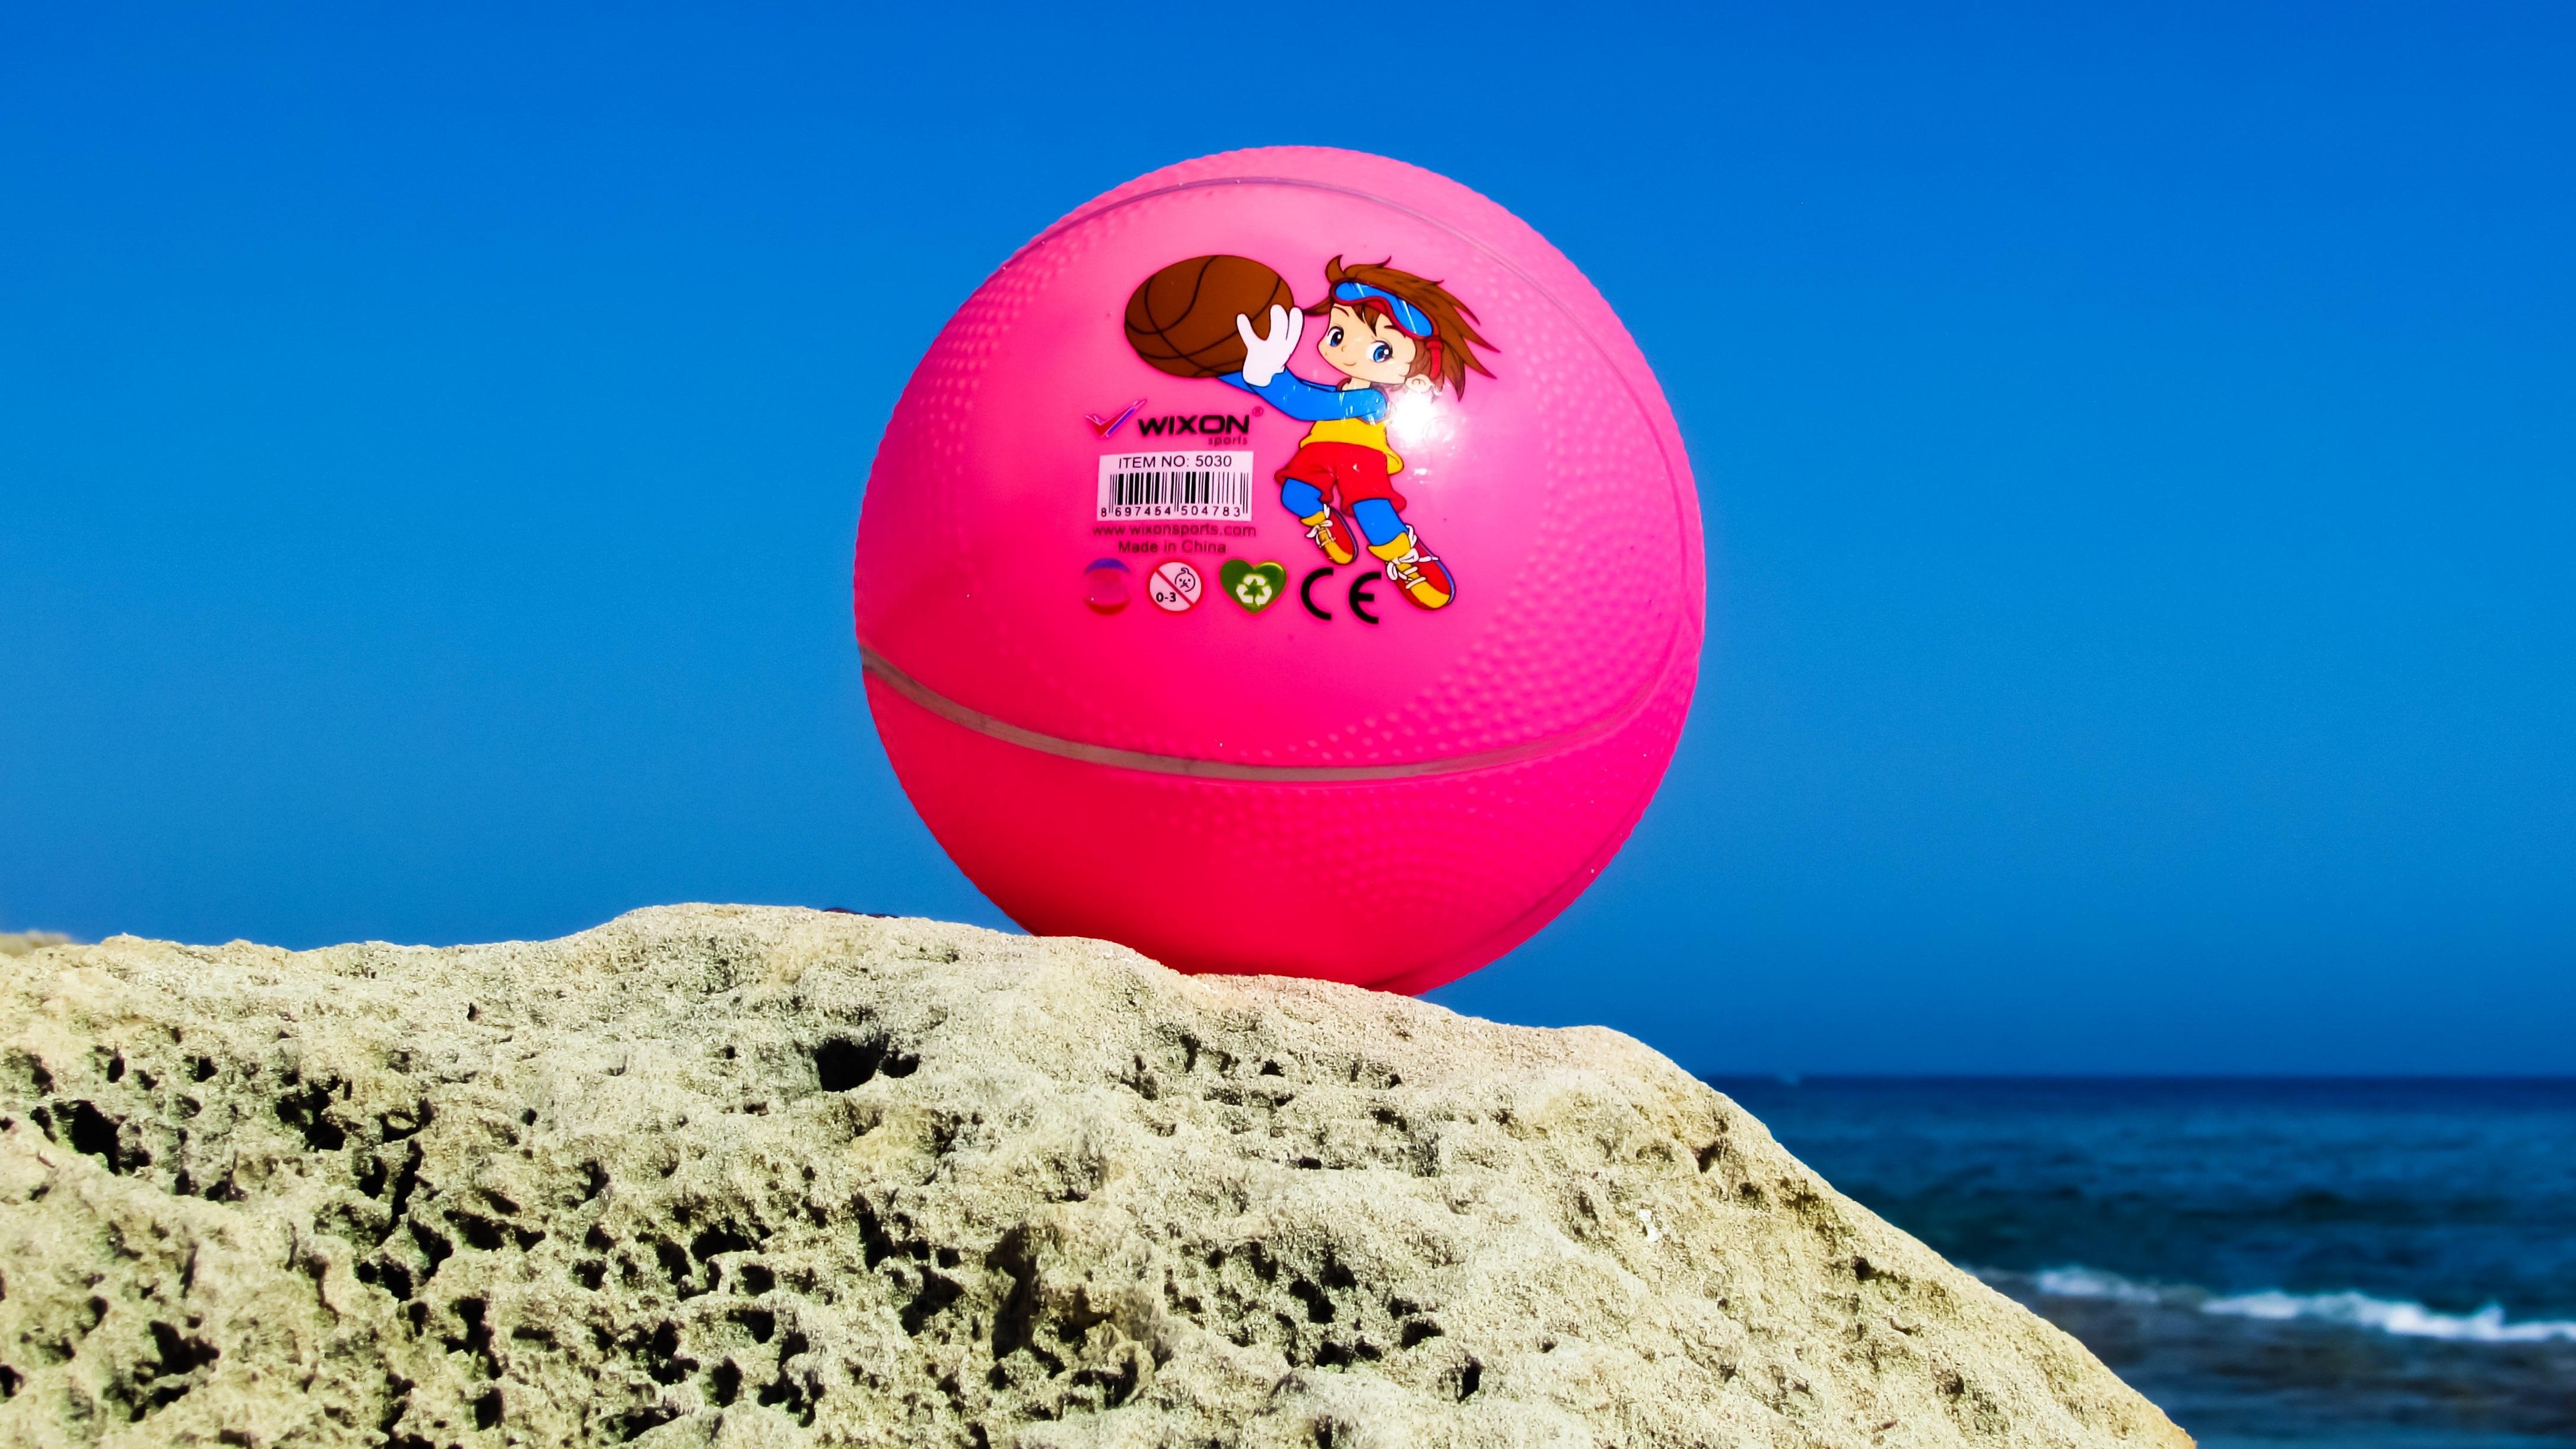 Gambar Pantai Laut Balon Udara Musim Panas Liburan Kendaraan Berwarna Merah Muda Waktu Luang Mainan Kesenangan Bola Gambar Kartun Atmosfer Bumi 4341x2441 1036521 Galeri Foto Pxhere